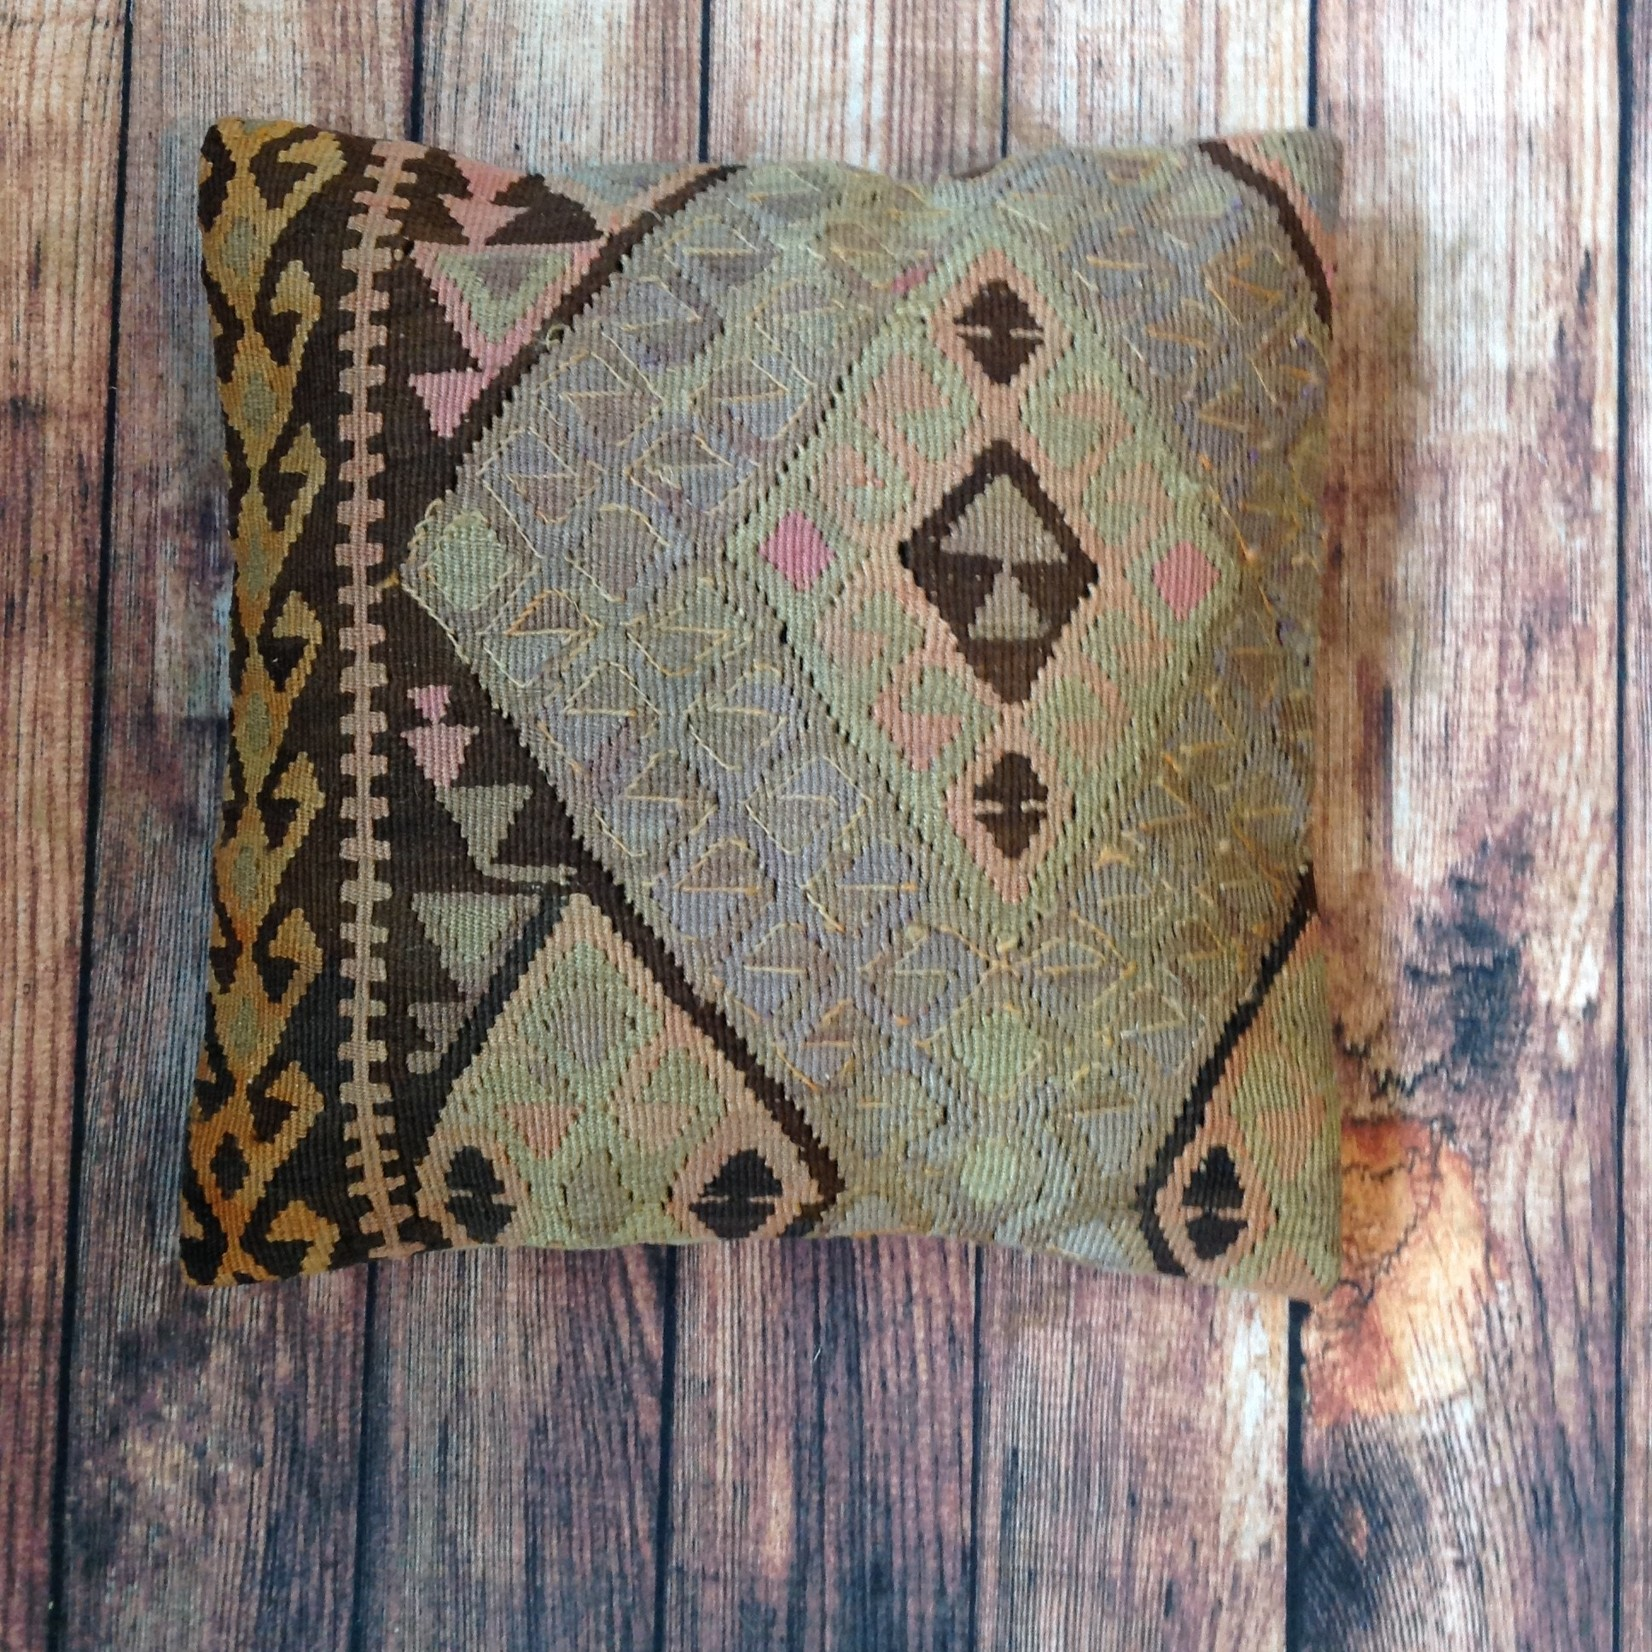 Gonca Teker Kocyildirim Gonca Teker Turkish Kilim Pillow Brown/Green/Diamonds - Tan Back 20 x 20